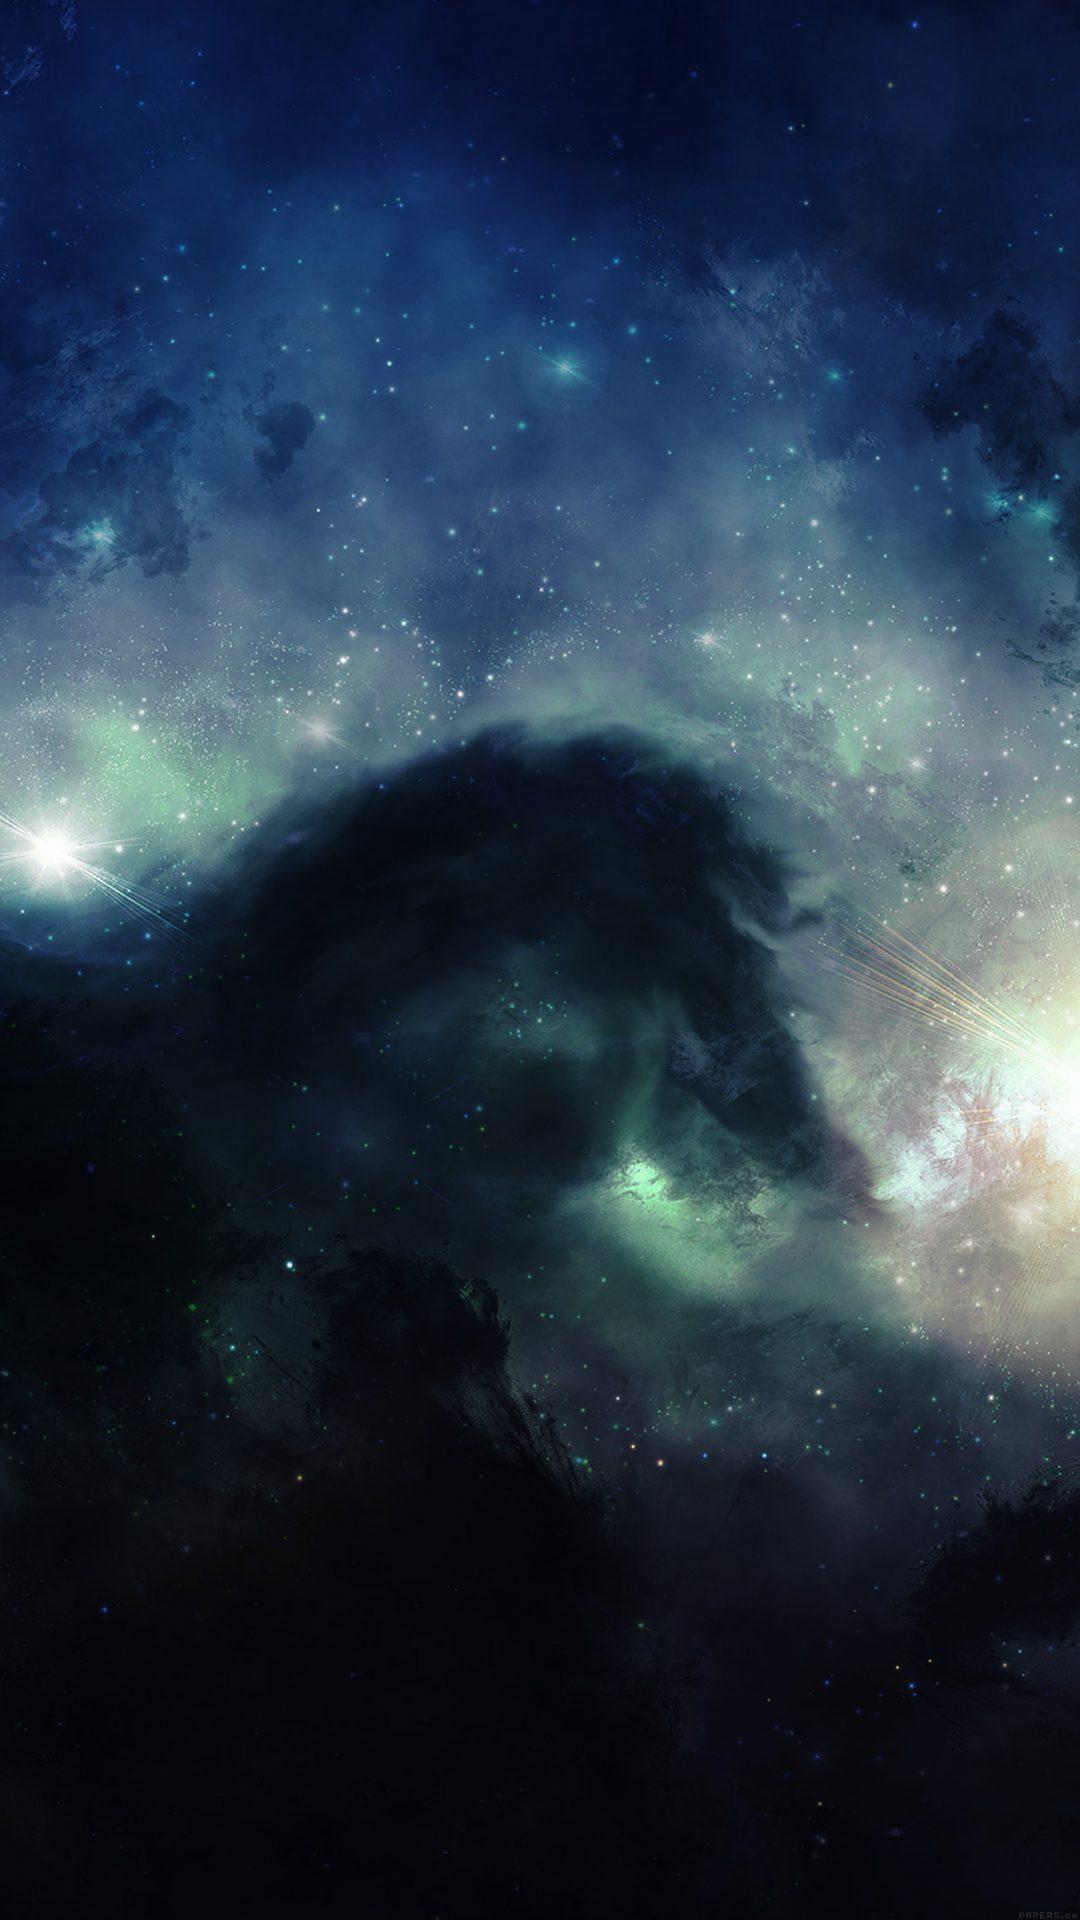 Illuminating Space Blue Star Galaxy Art